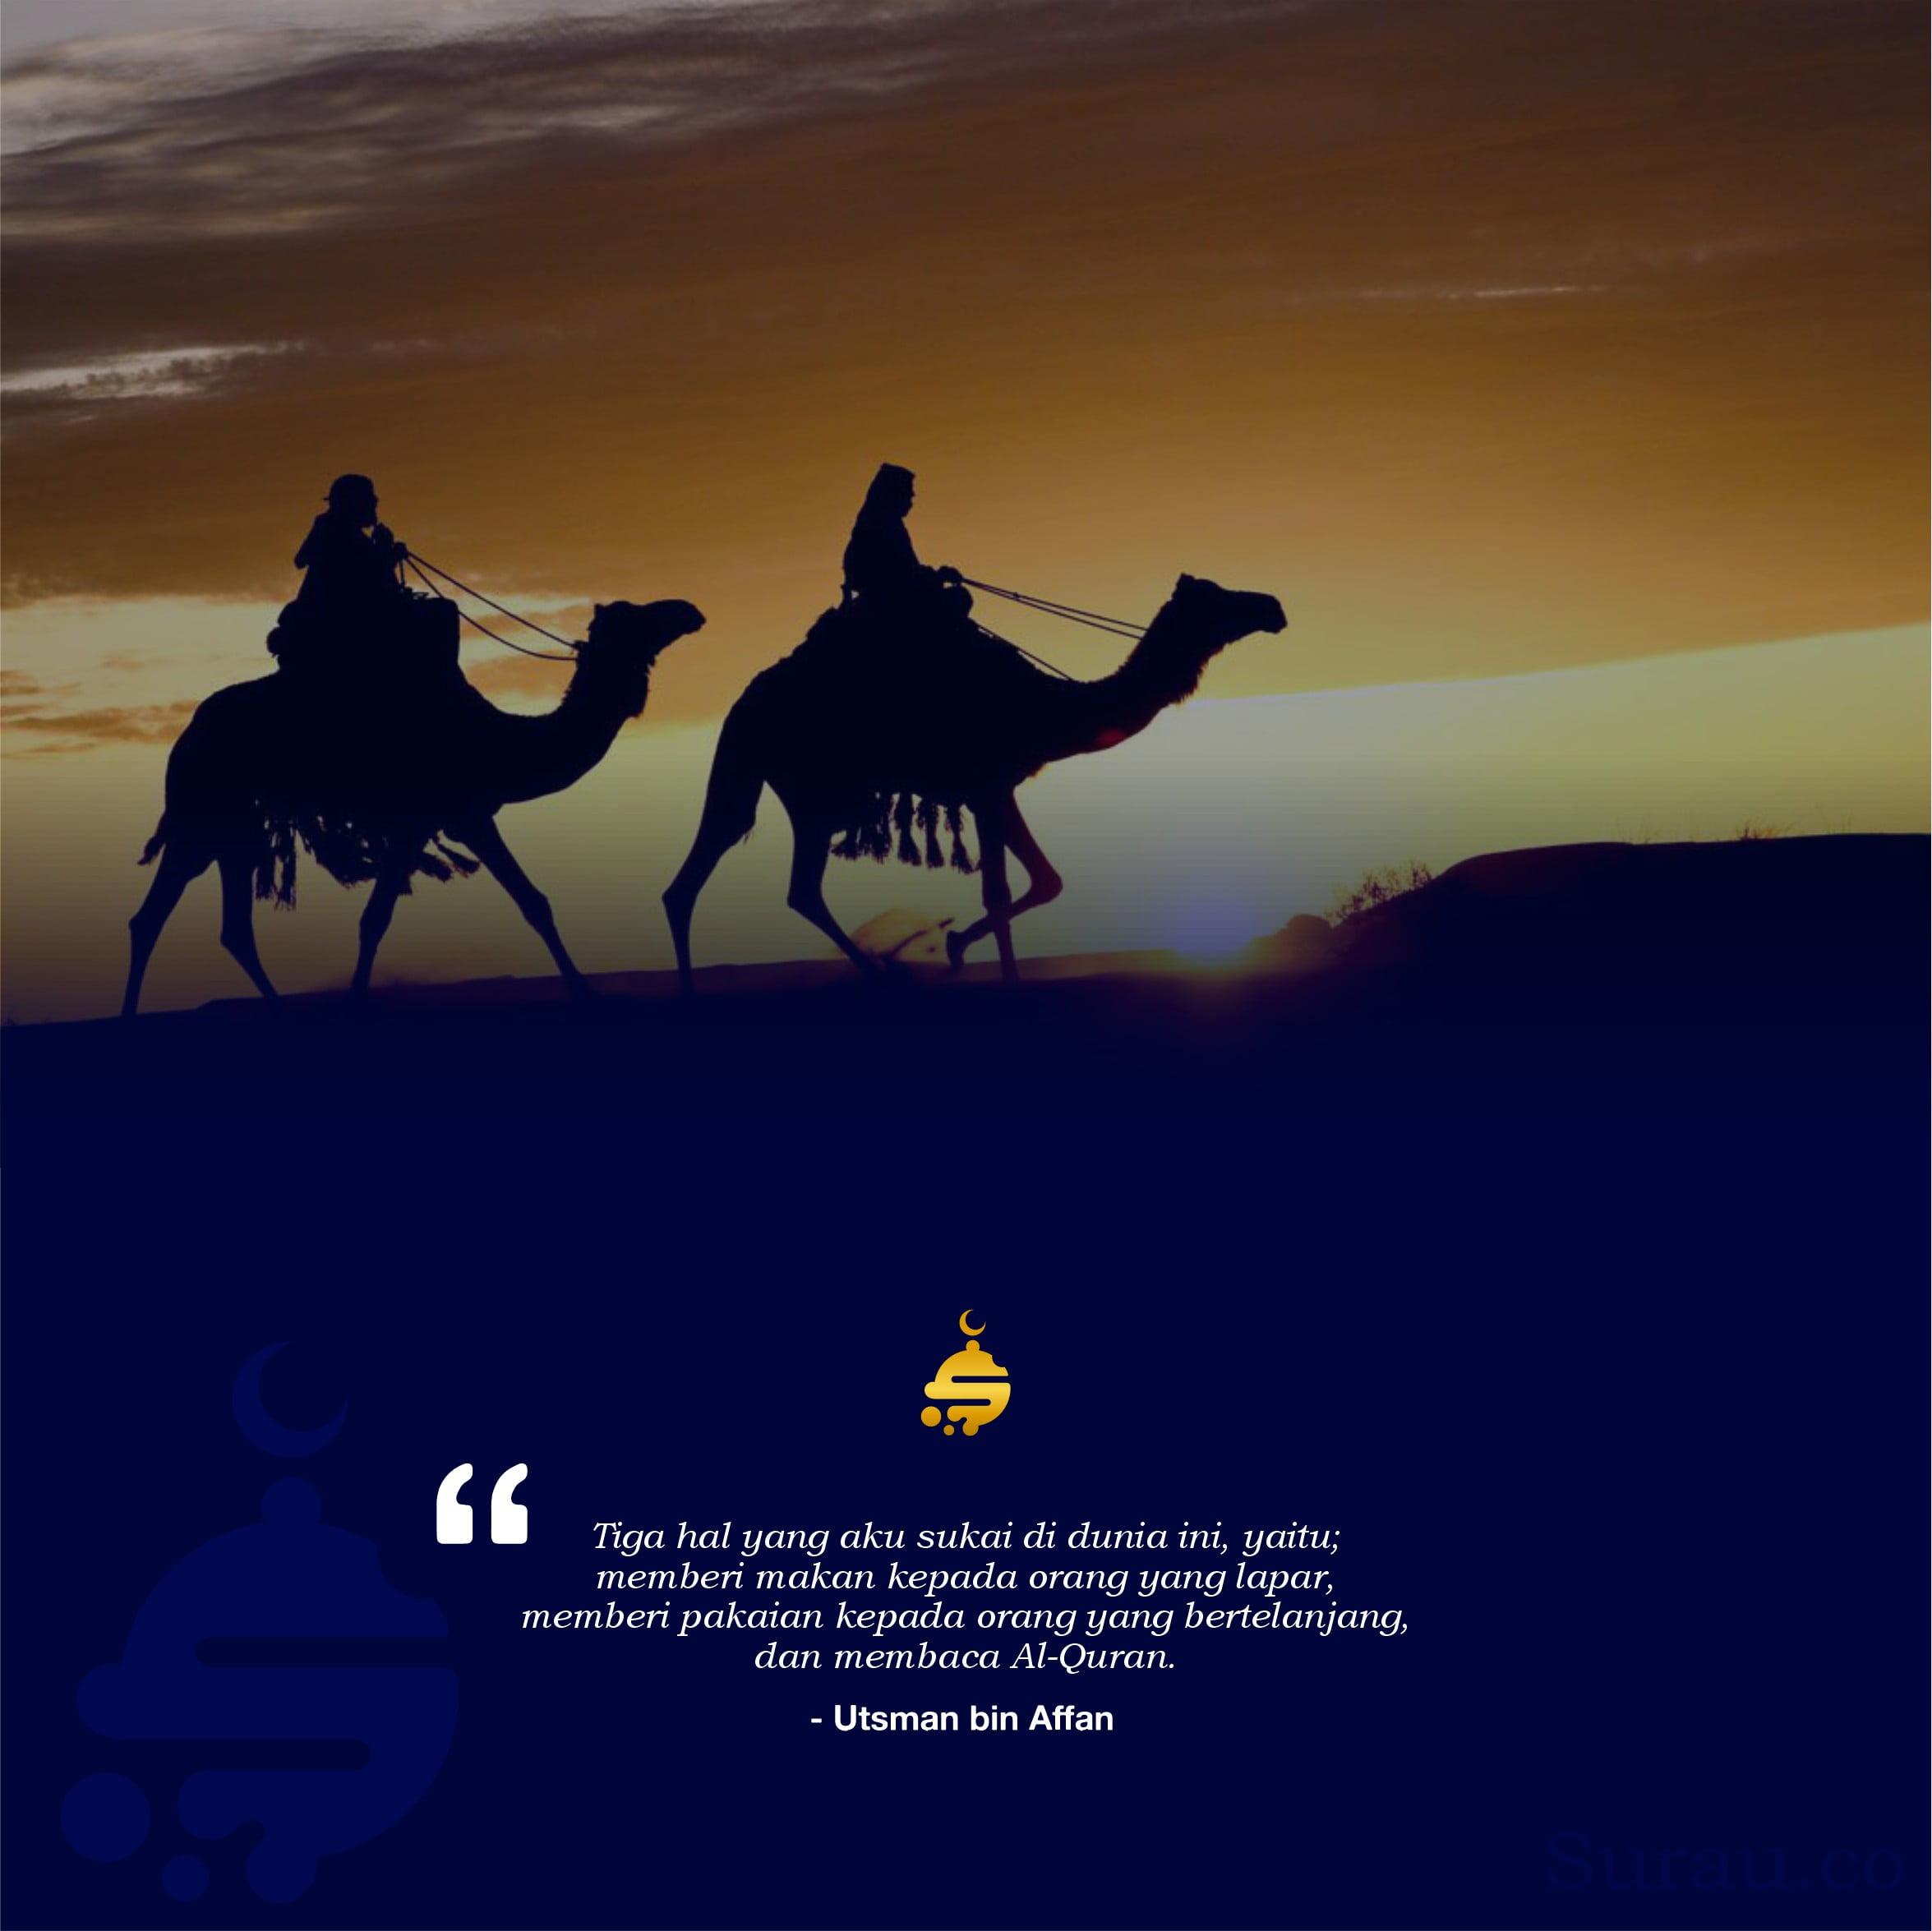 Quotes Utsman bin Affan 1